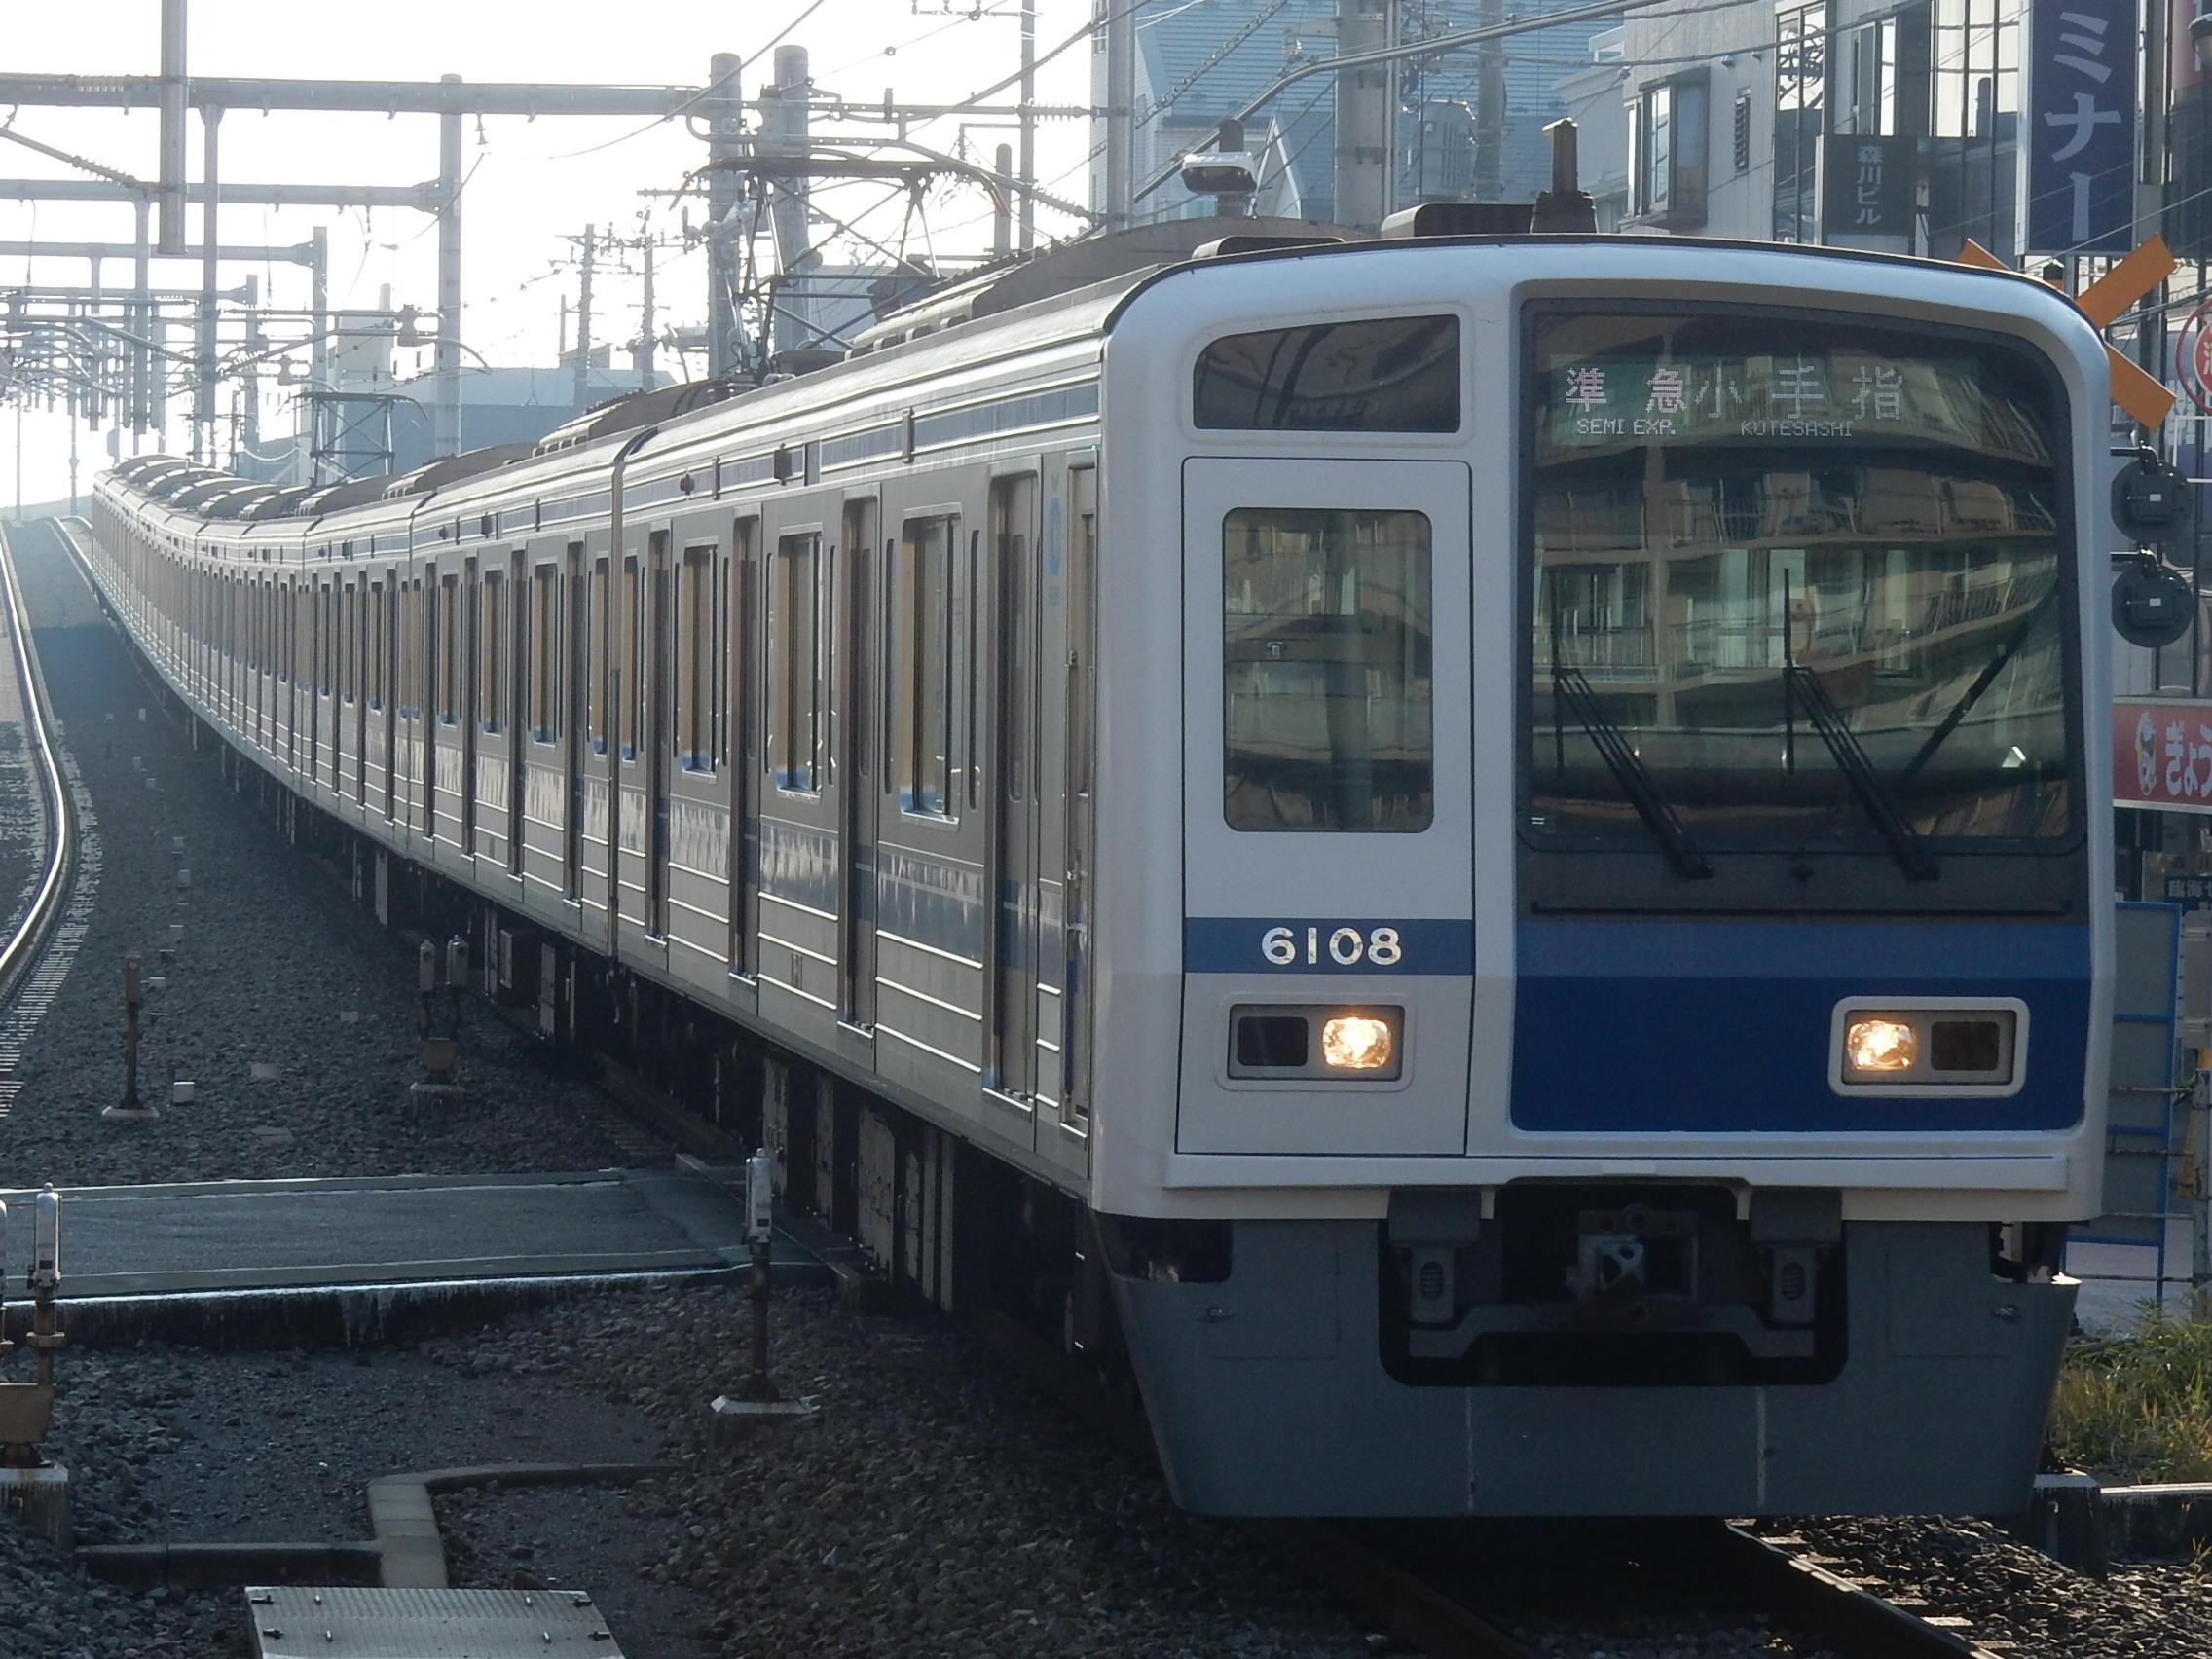 RSCN0765.jpg